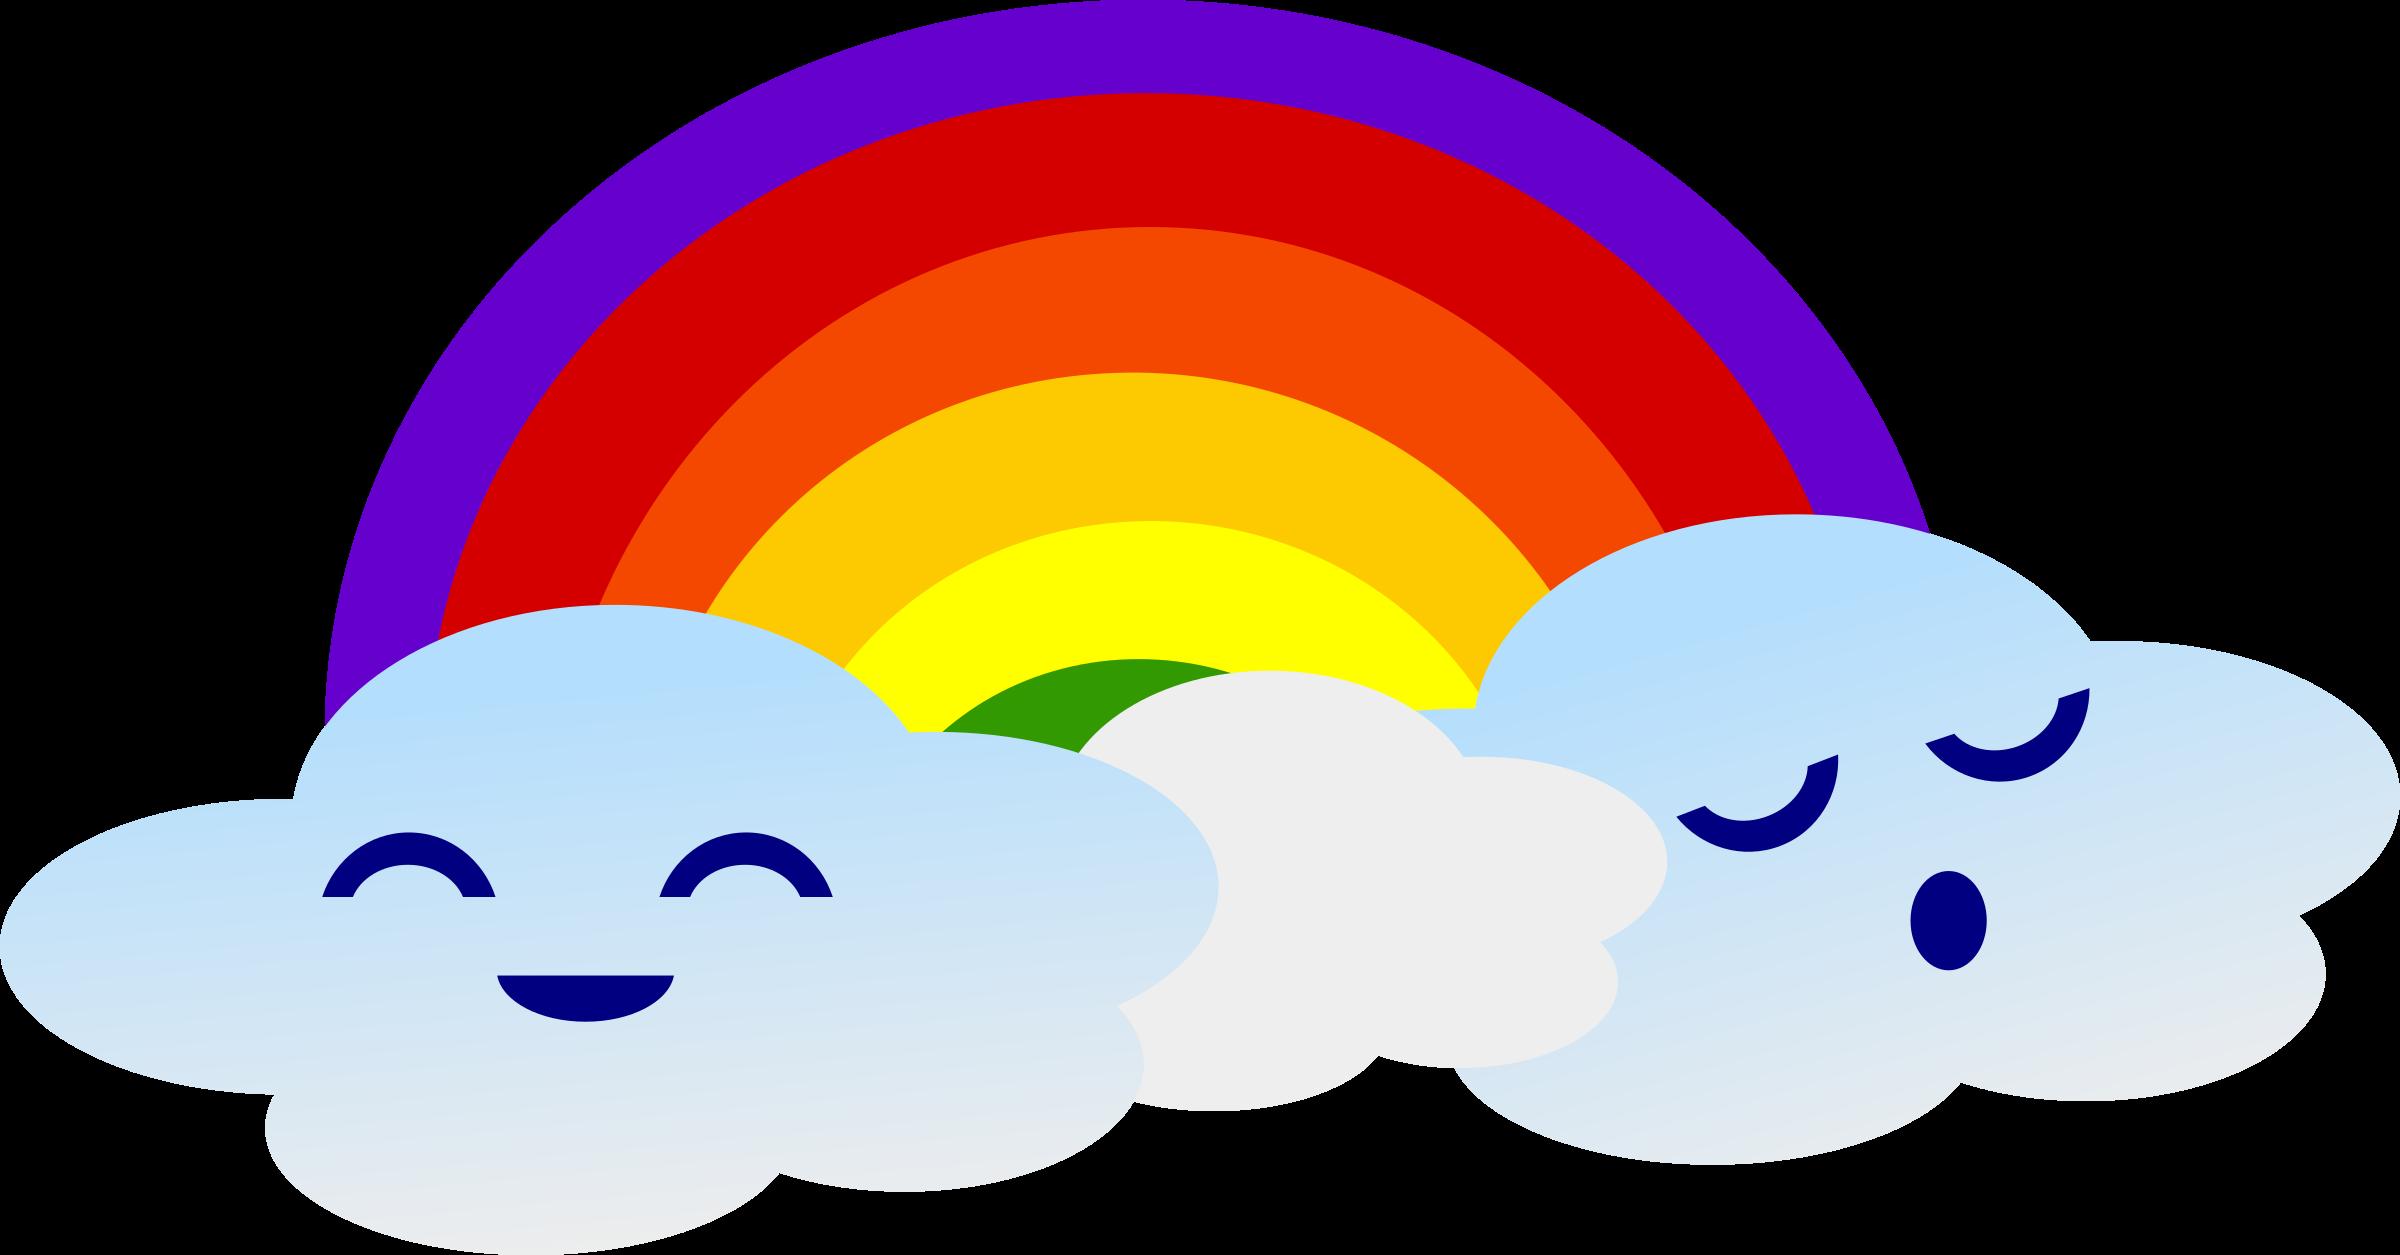 Kawaii big image png. Clipart rainbow cute